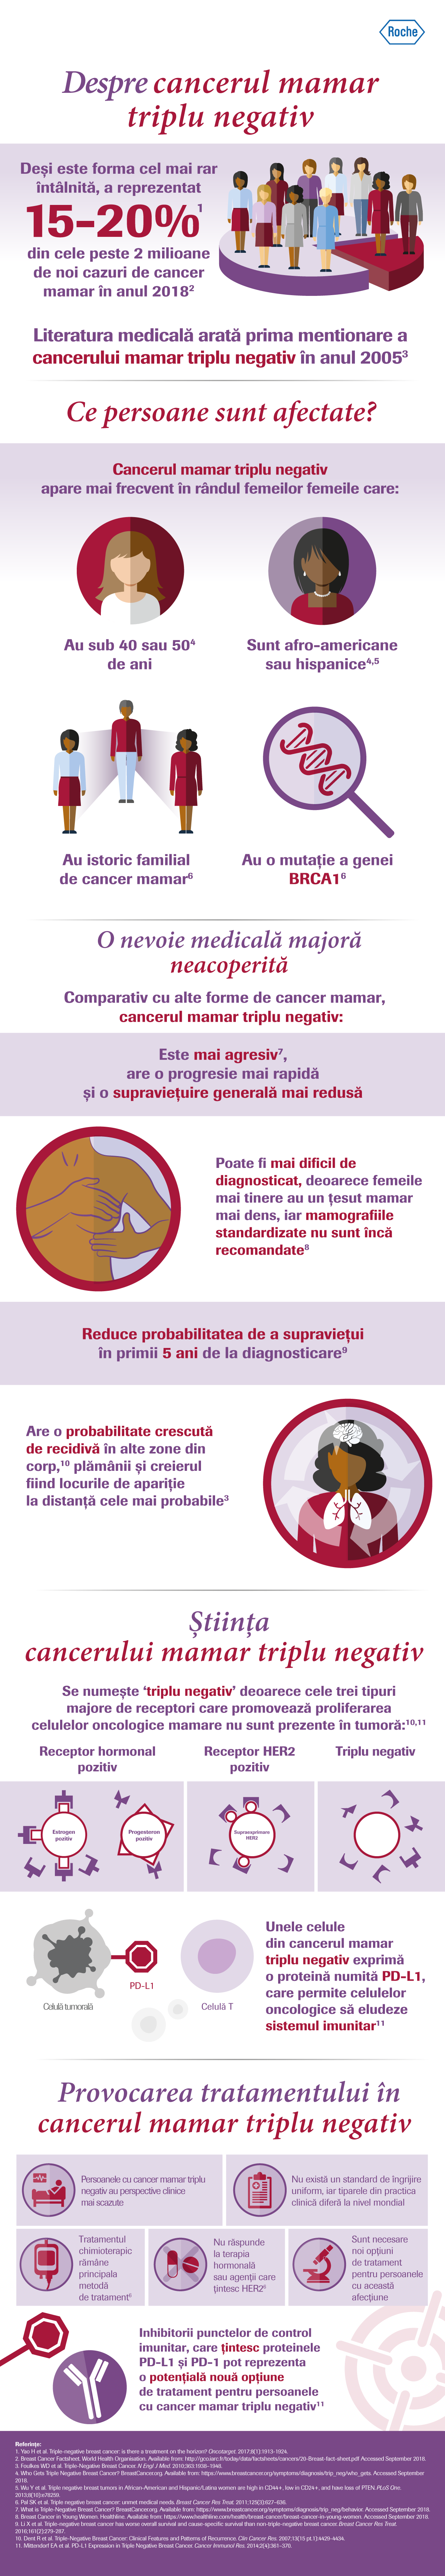 cancerul mamar triplu negativ il papilloma virus negli uomini